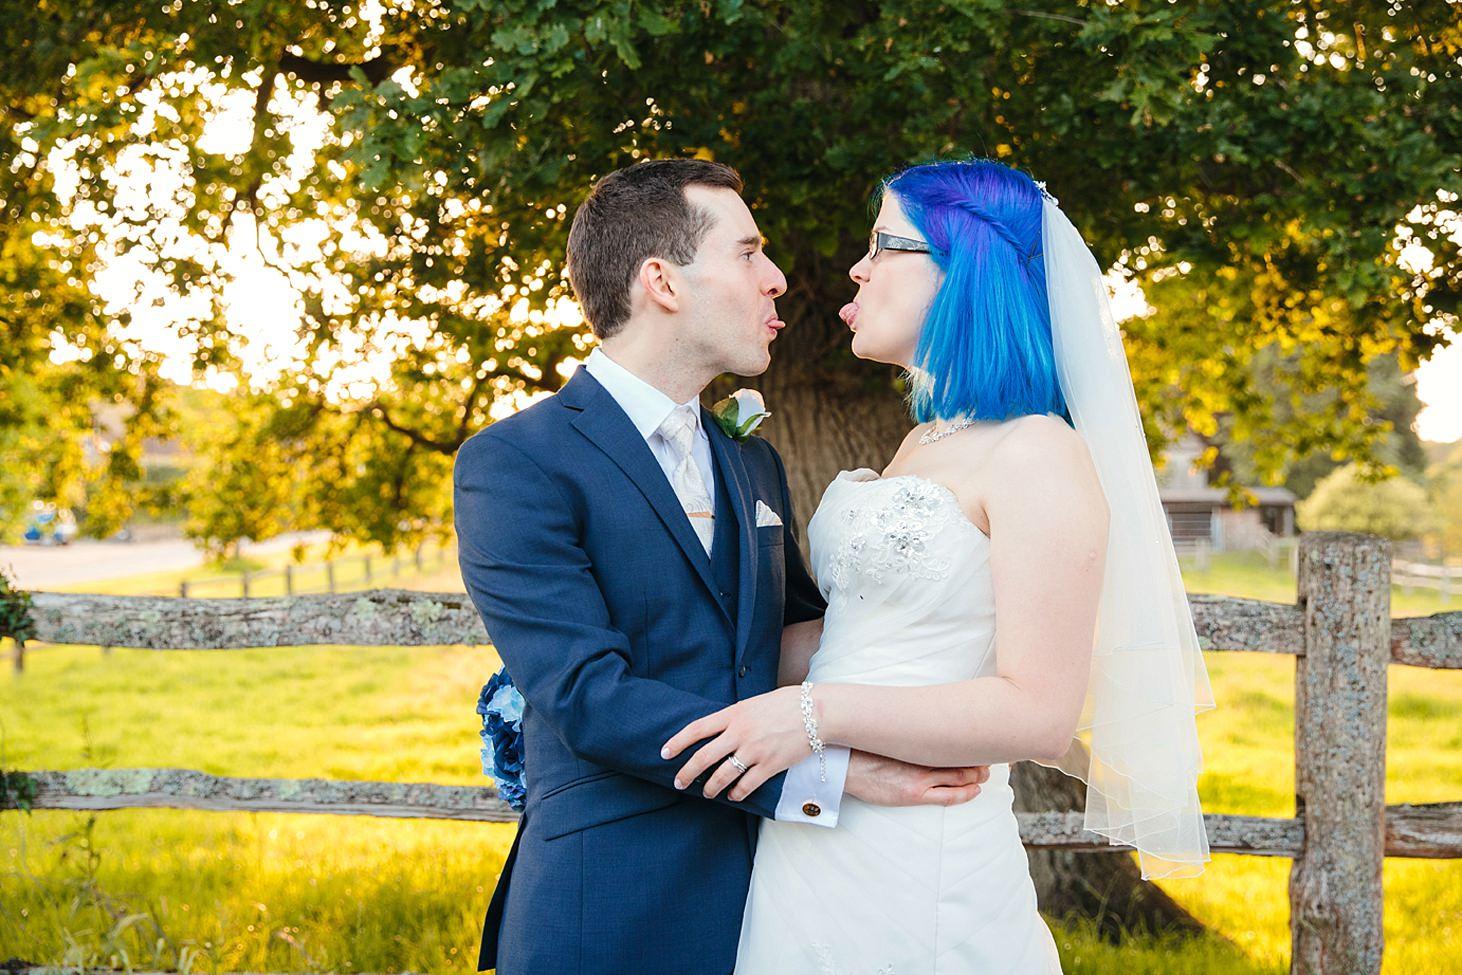 gate street barn wedding photography bride and groom fun portrait